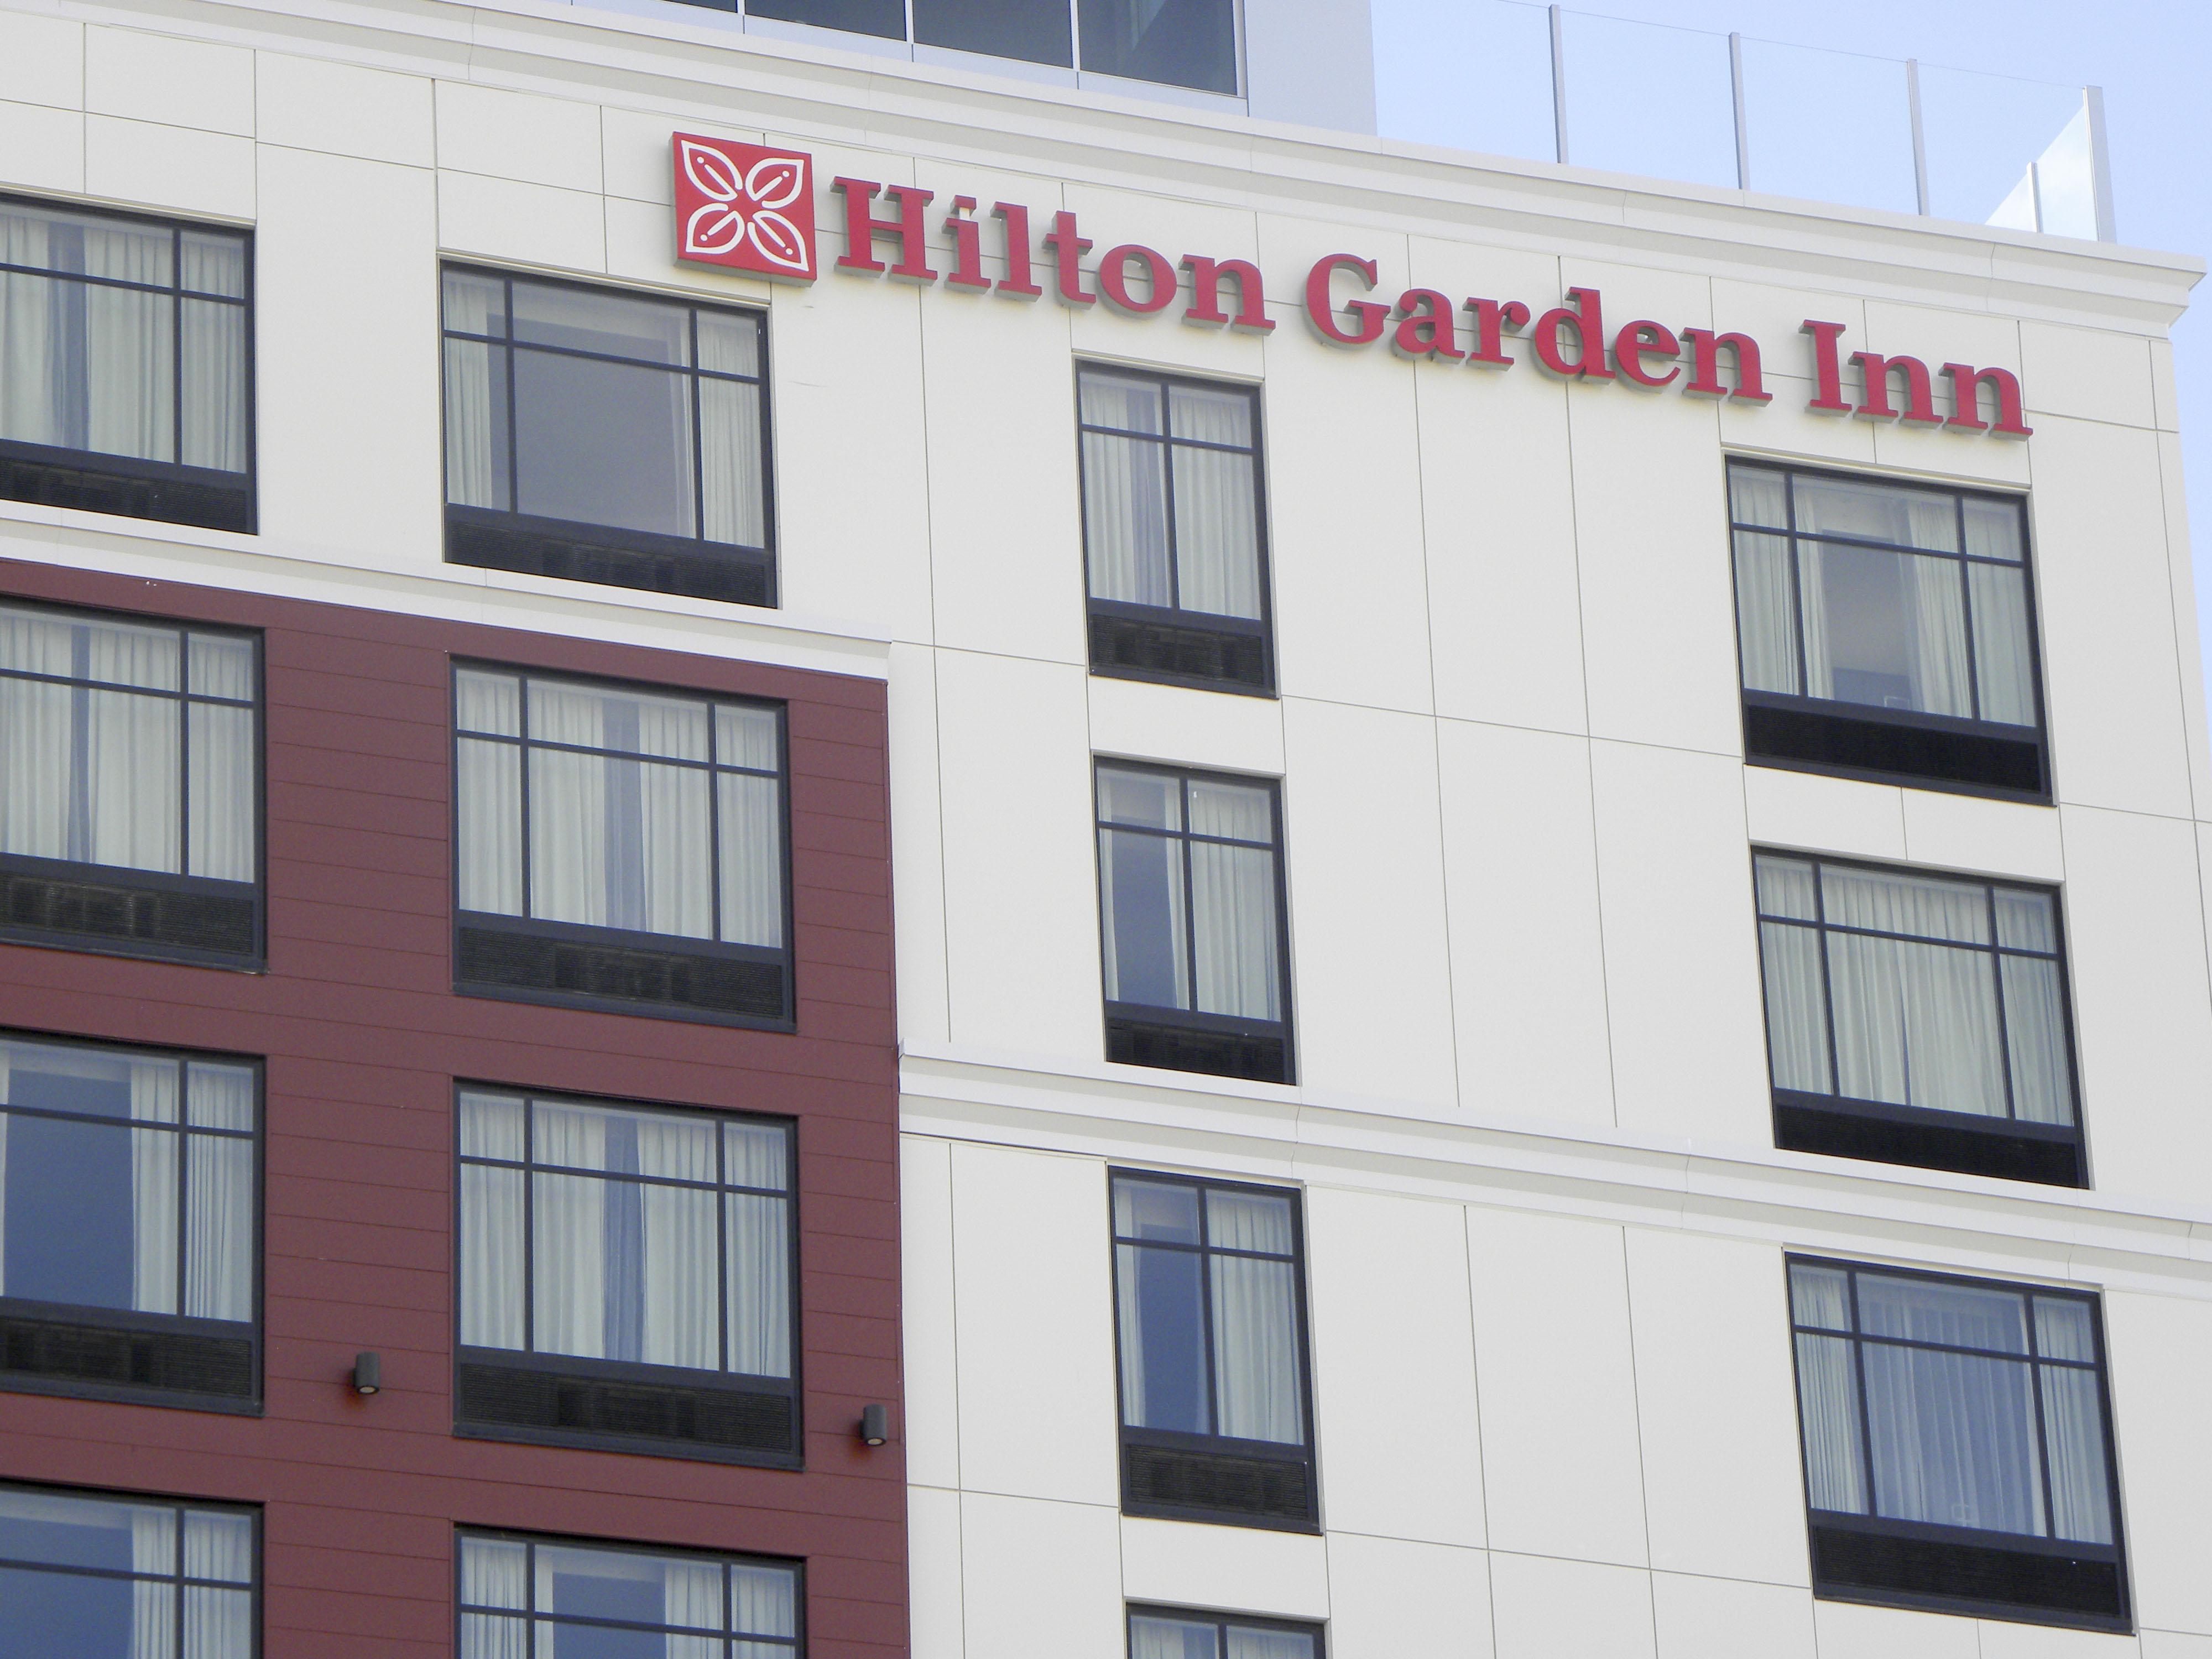 Hilton Garden Inn Dubuque Downtown Iowa Hotel 4489917 Salonurodyinfo